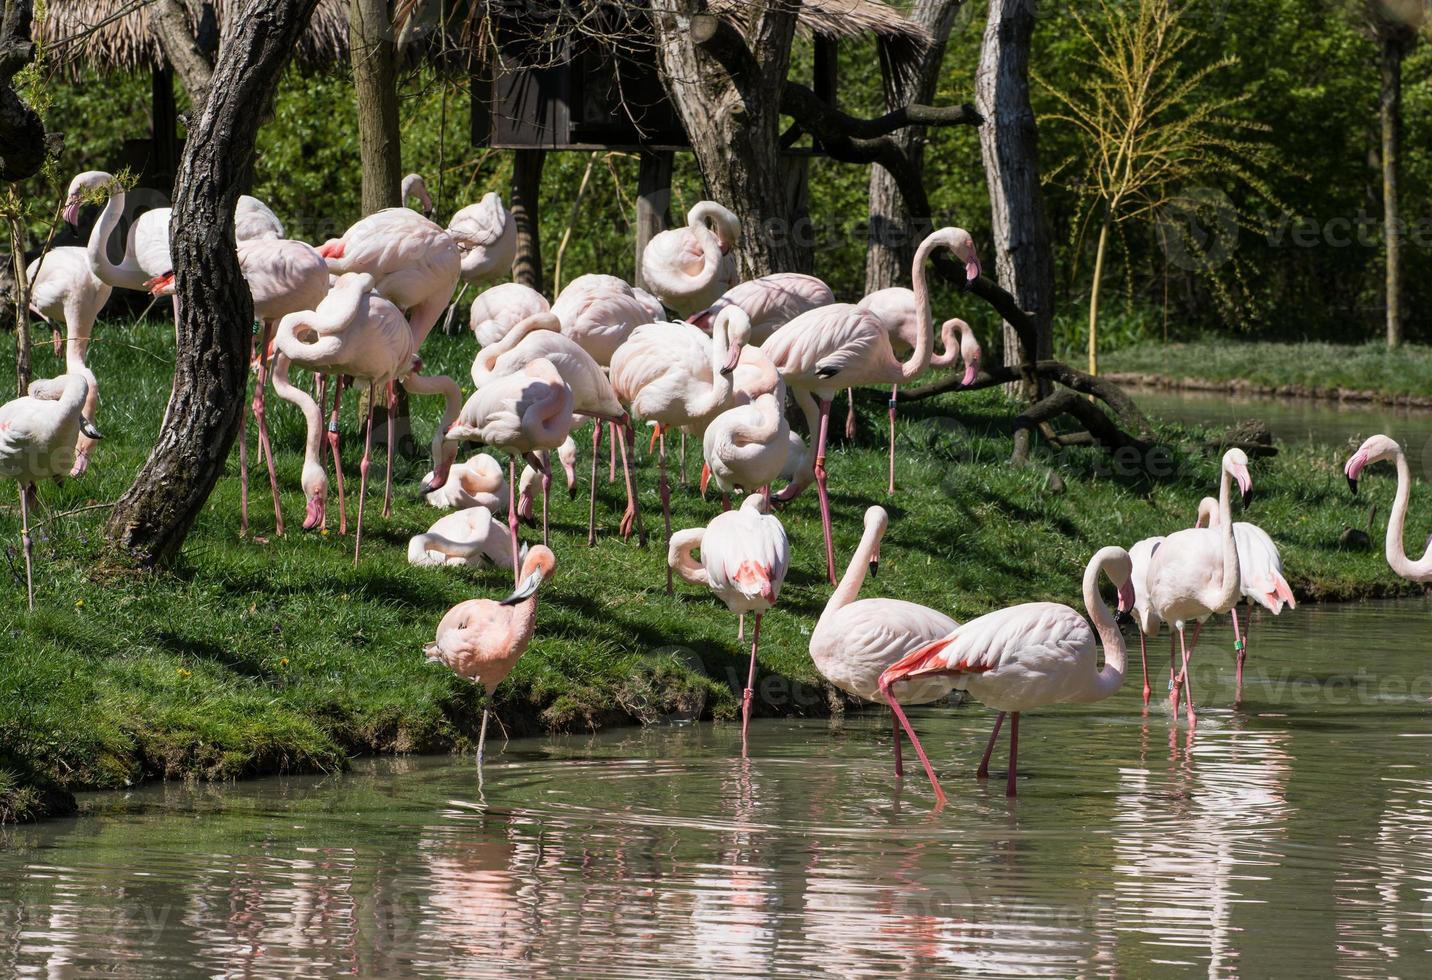 grupp större flamingos (phoenicopterus ruber roseus) foto